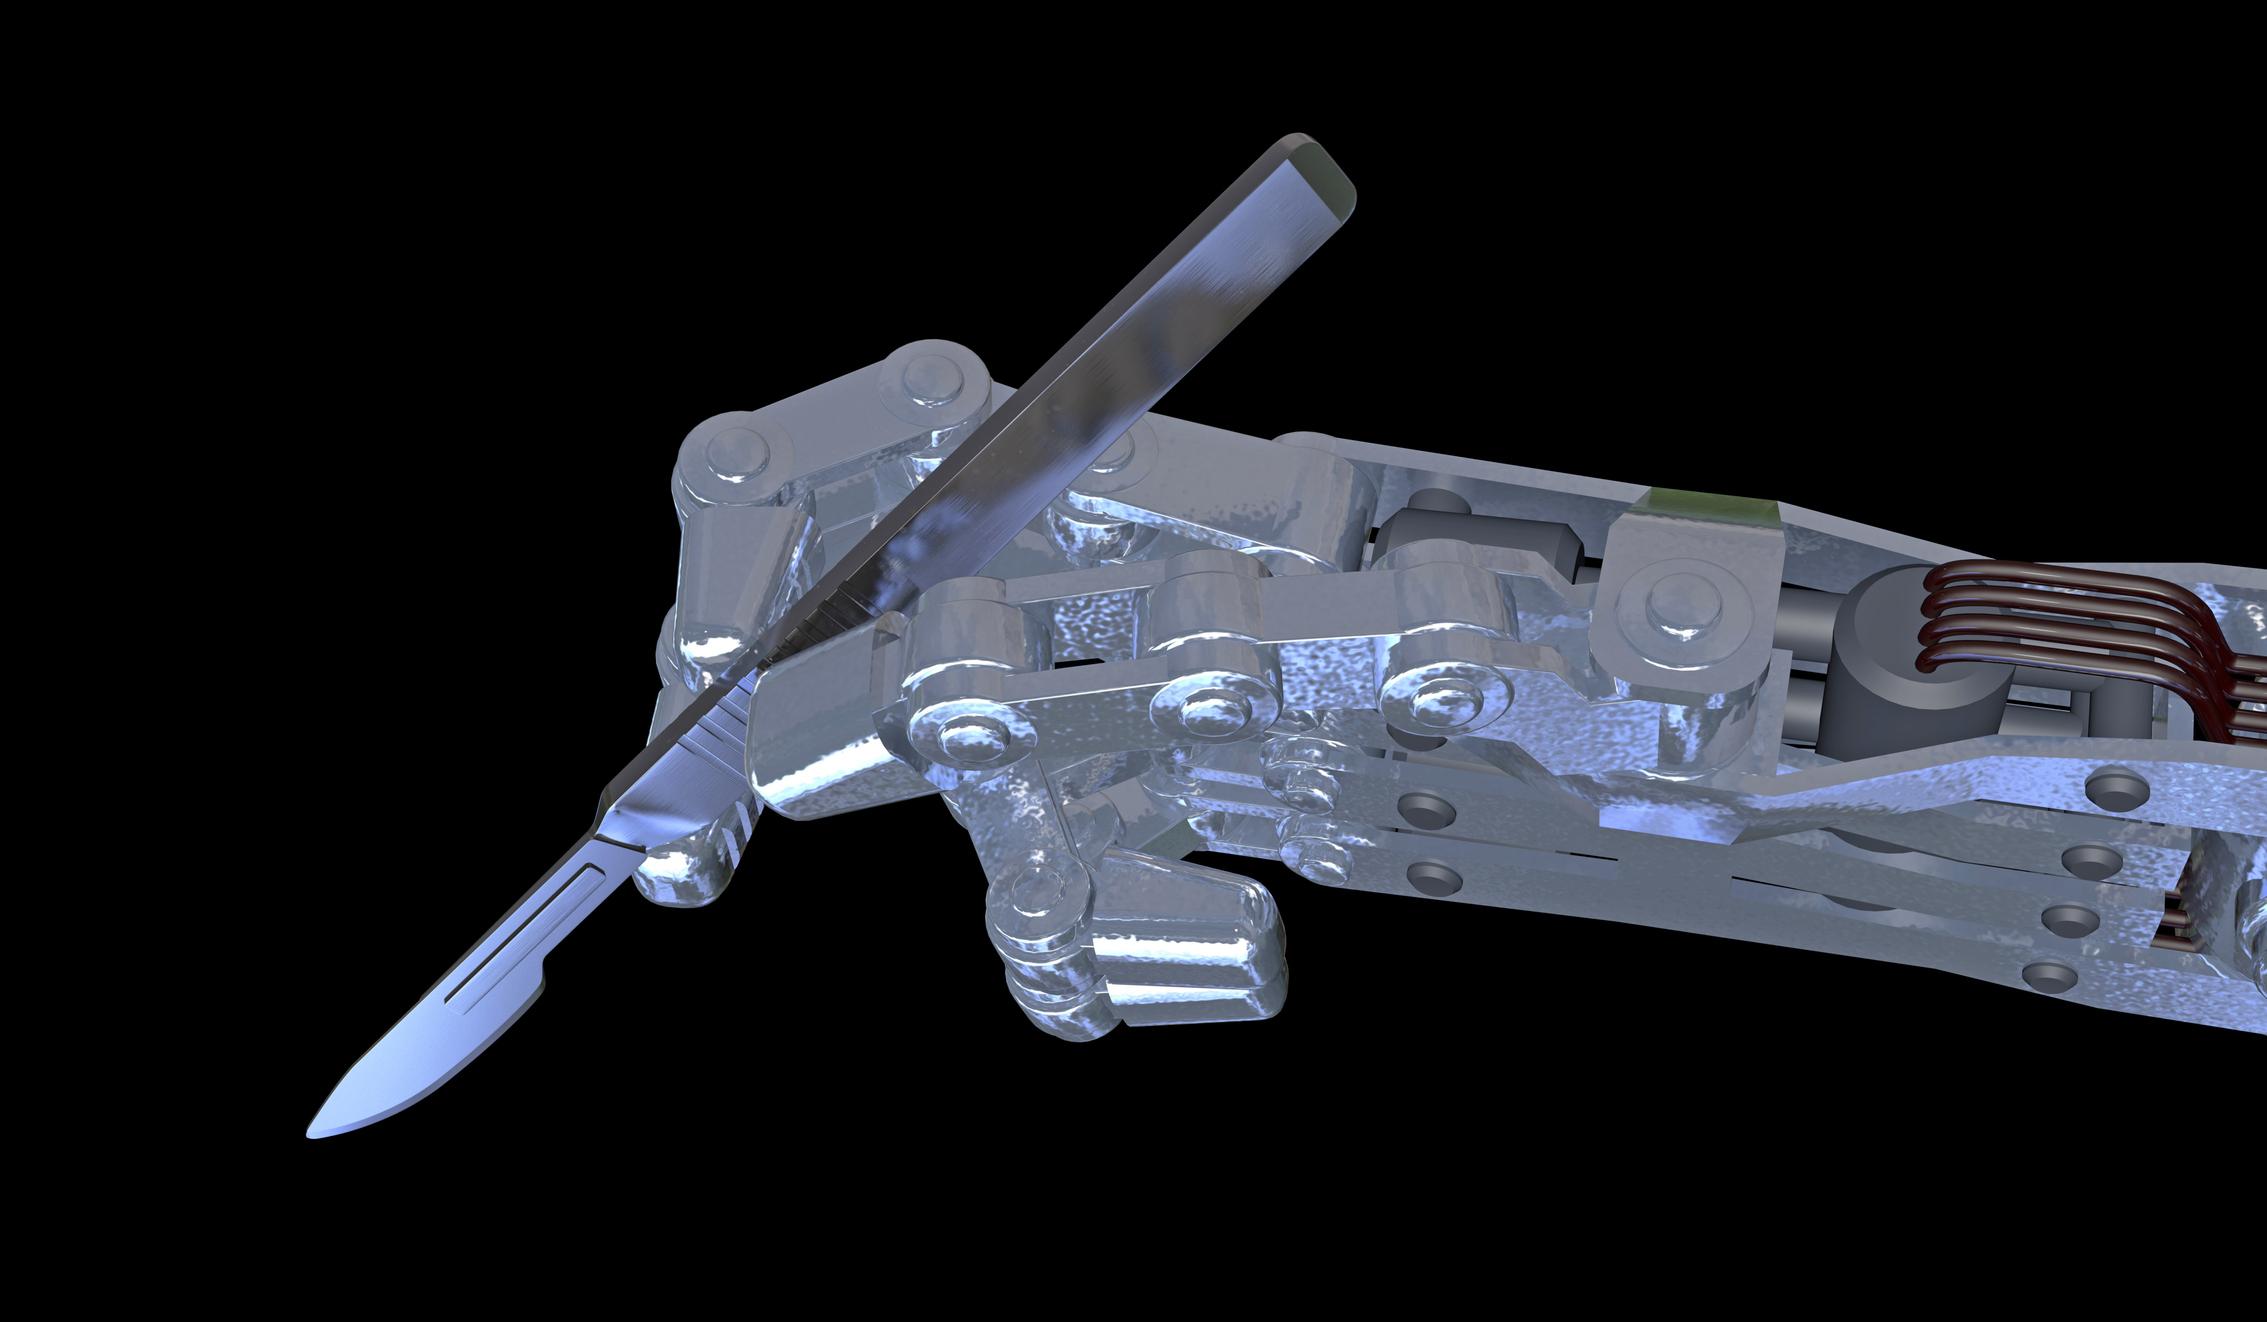 Robotic hand holding a scalpel.